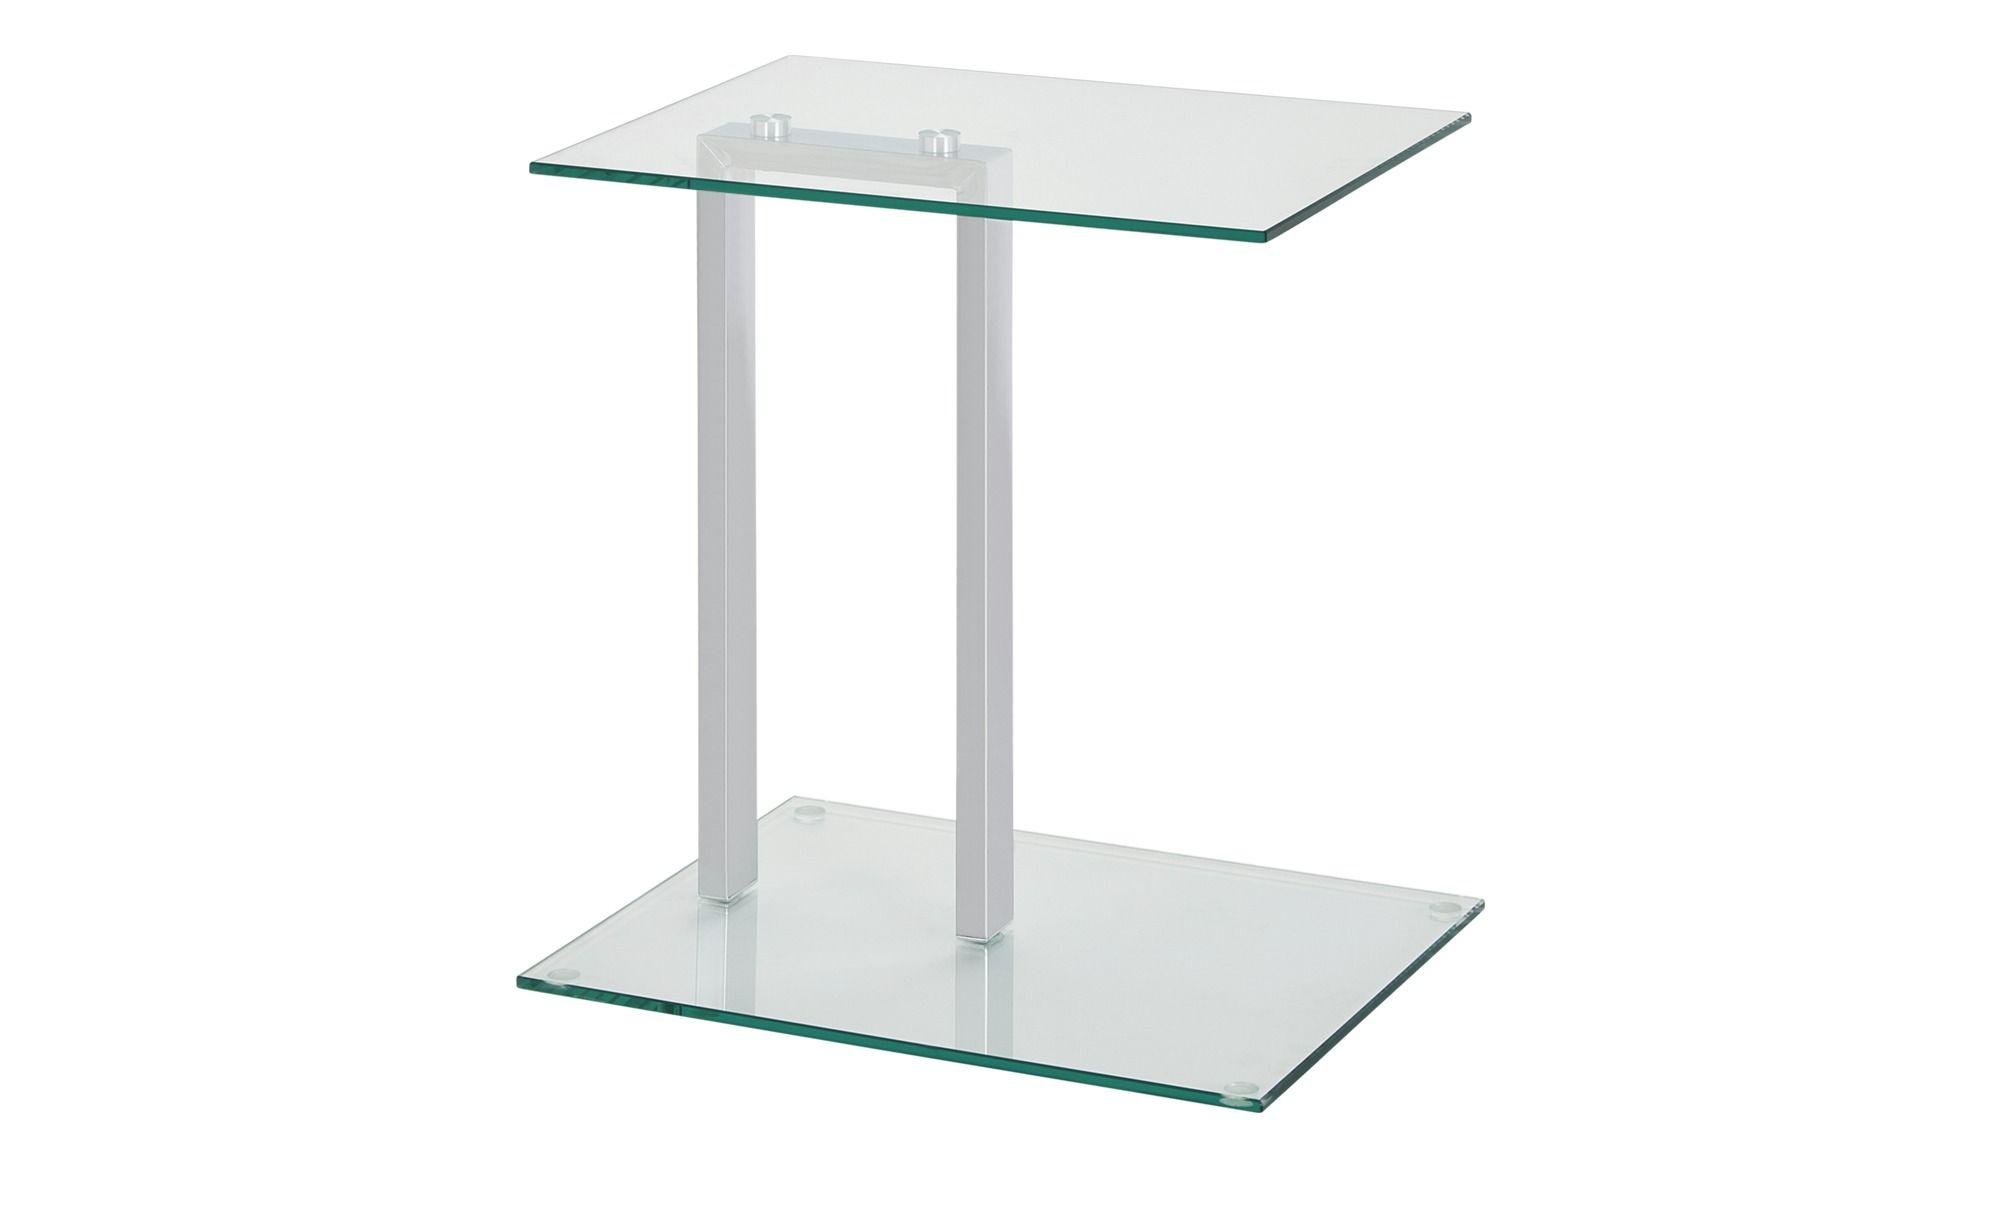 Beistelltisch Hanau Transparent Klar Materialmix 45 Cm 50 Cm